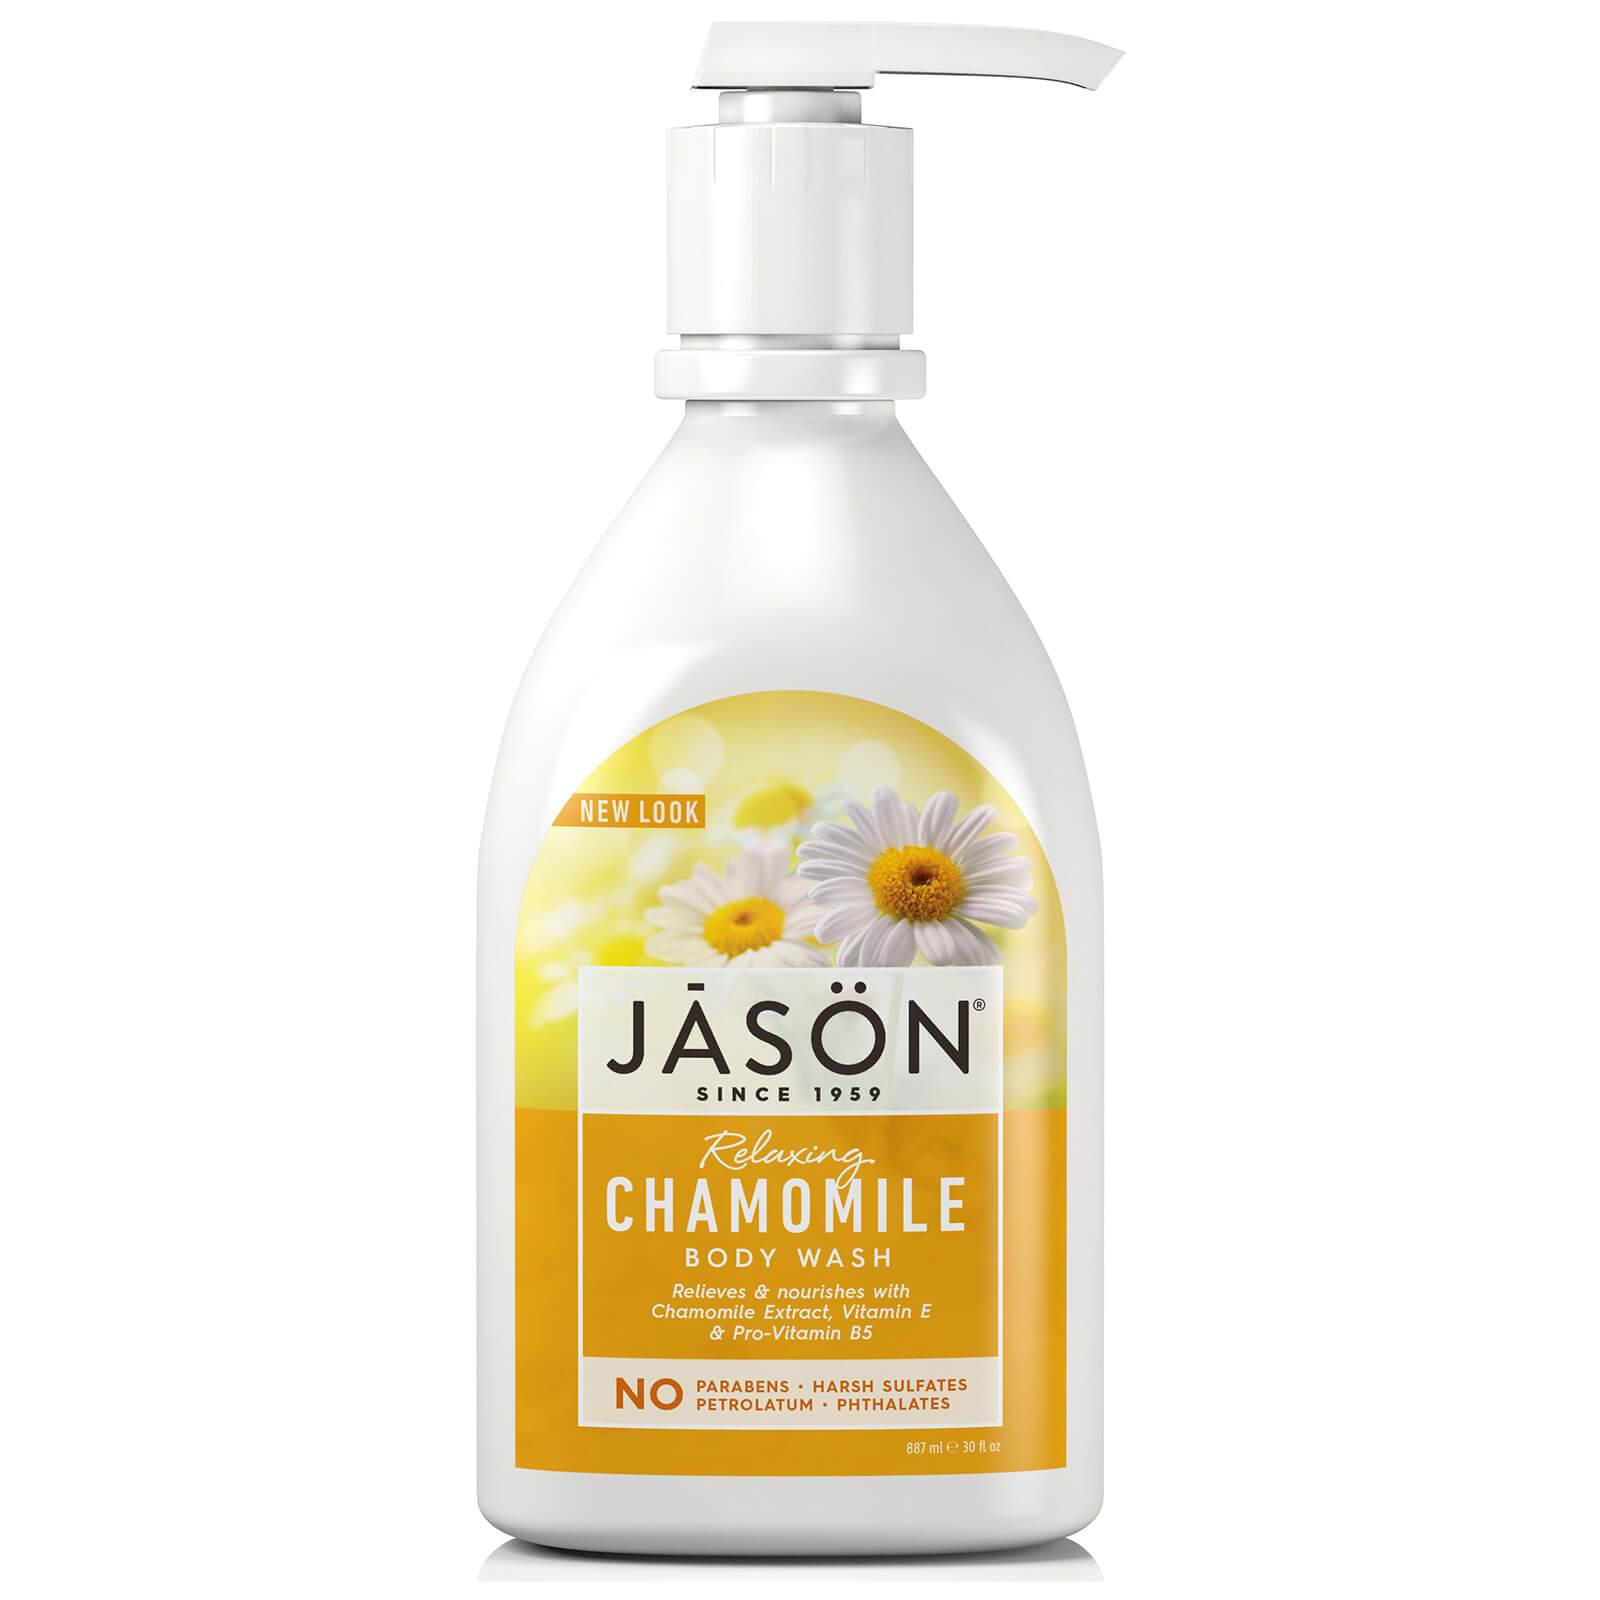 Купить Гель для душа «Ромашка» JASON Relaxing Chamomile Body Wash 887 мл